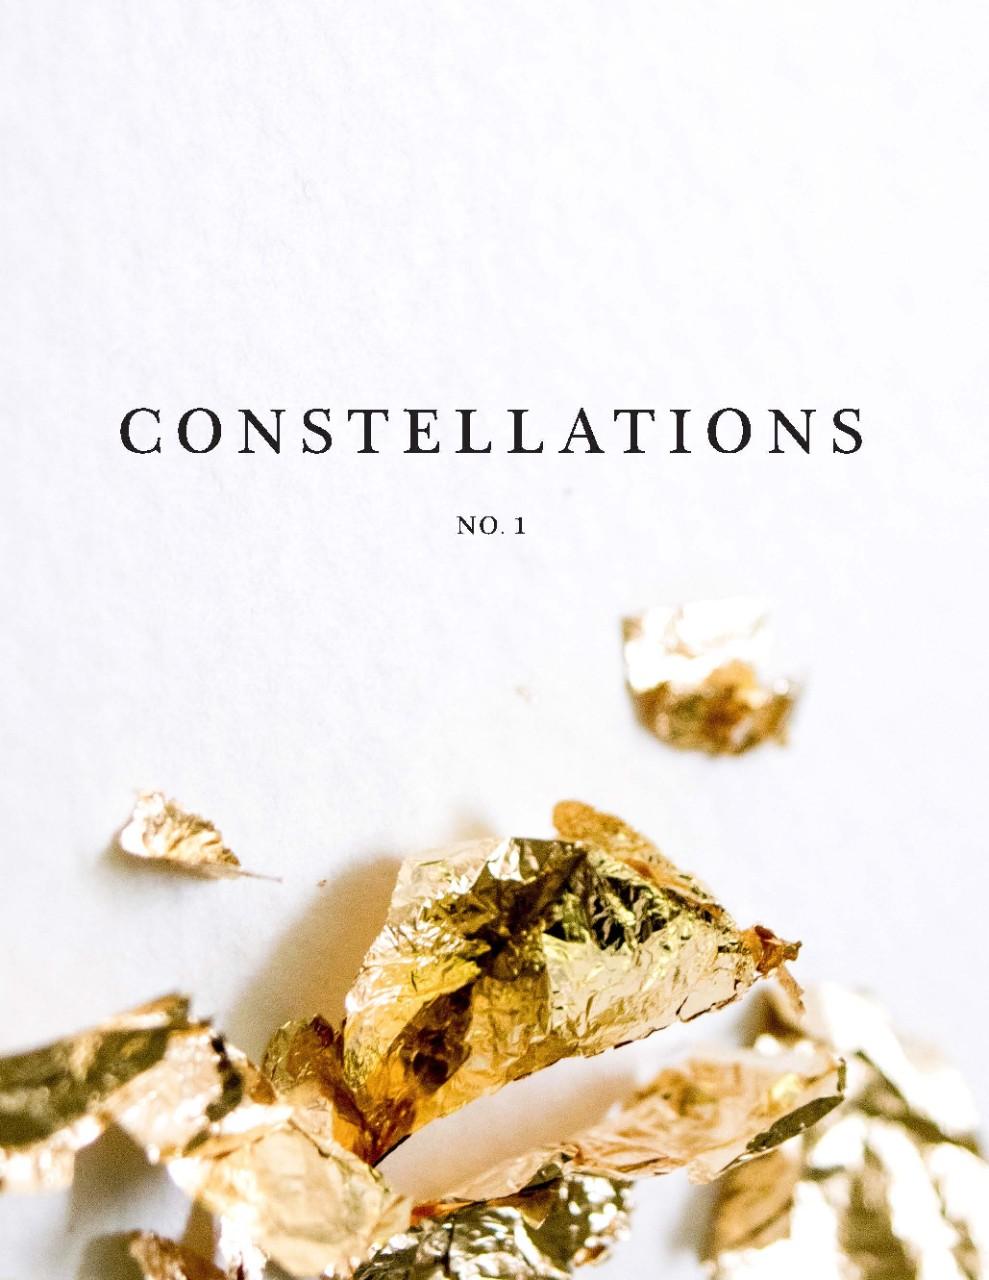 Constellations artwork by Abbey Geverdt